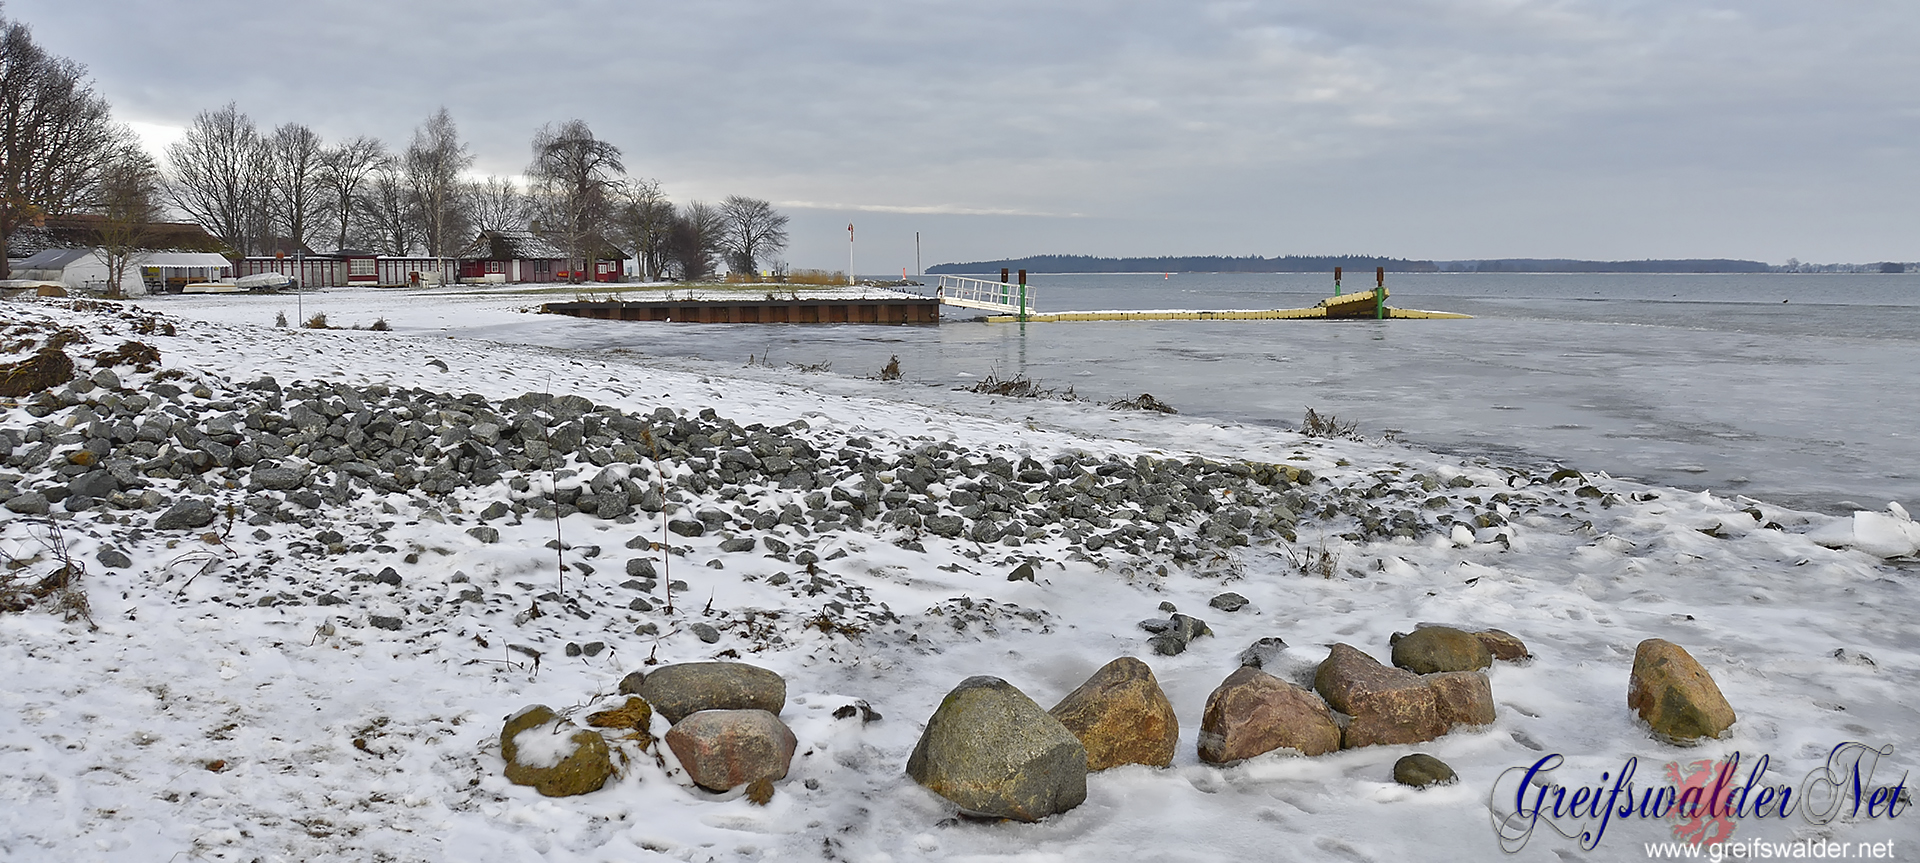 Winter an der Dänischen Wiek in Greifswald-Wieck